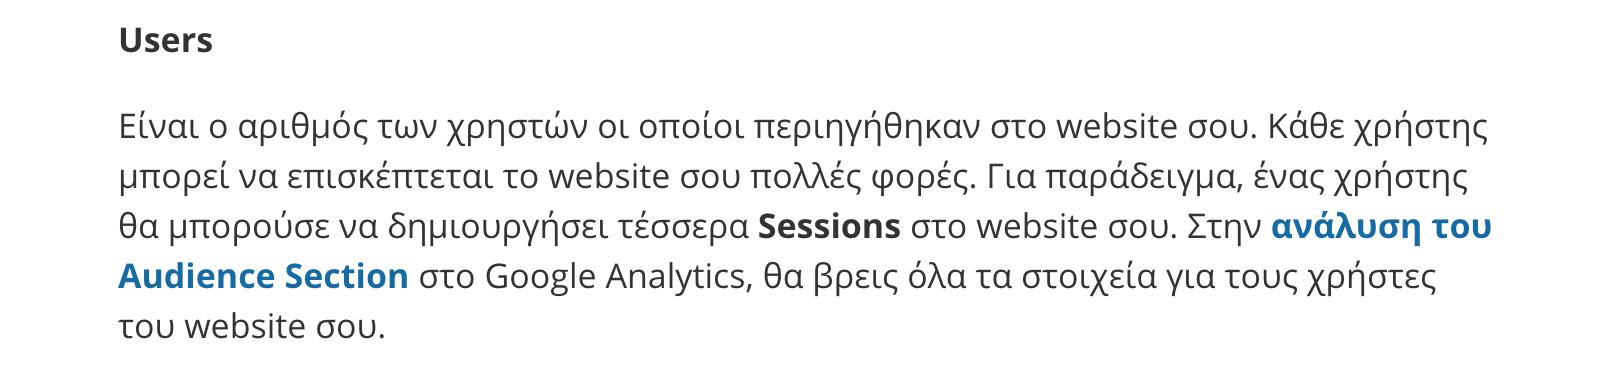 "Internal link με anchor text τη φράση ""ανάλυση του Audience Section"""